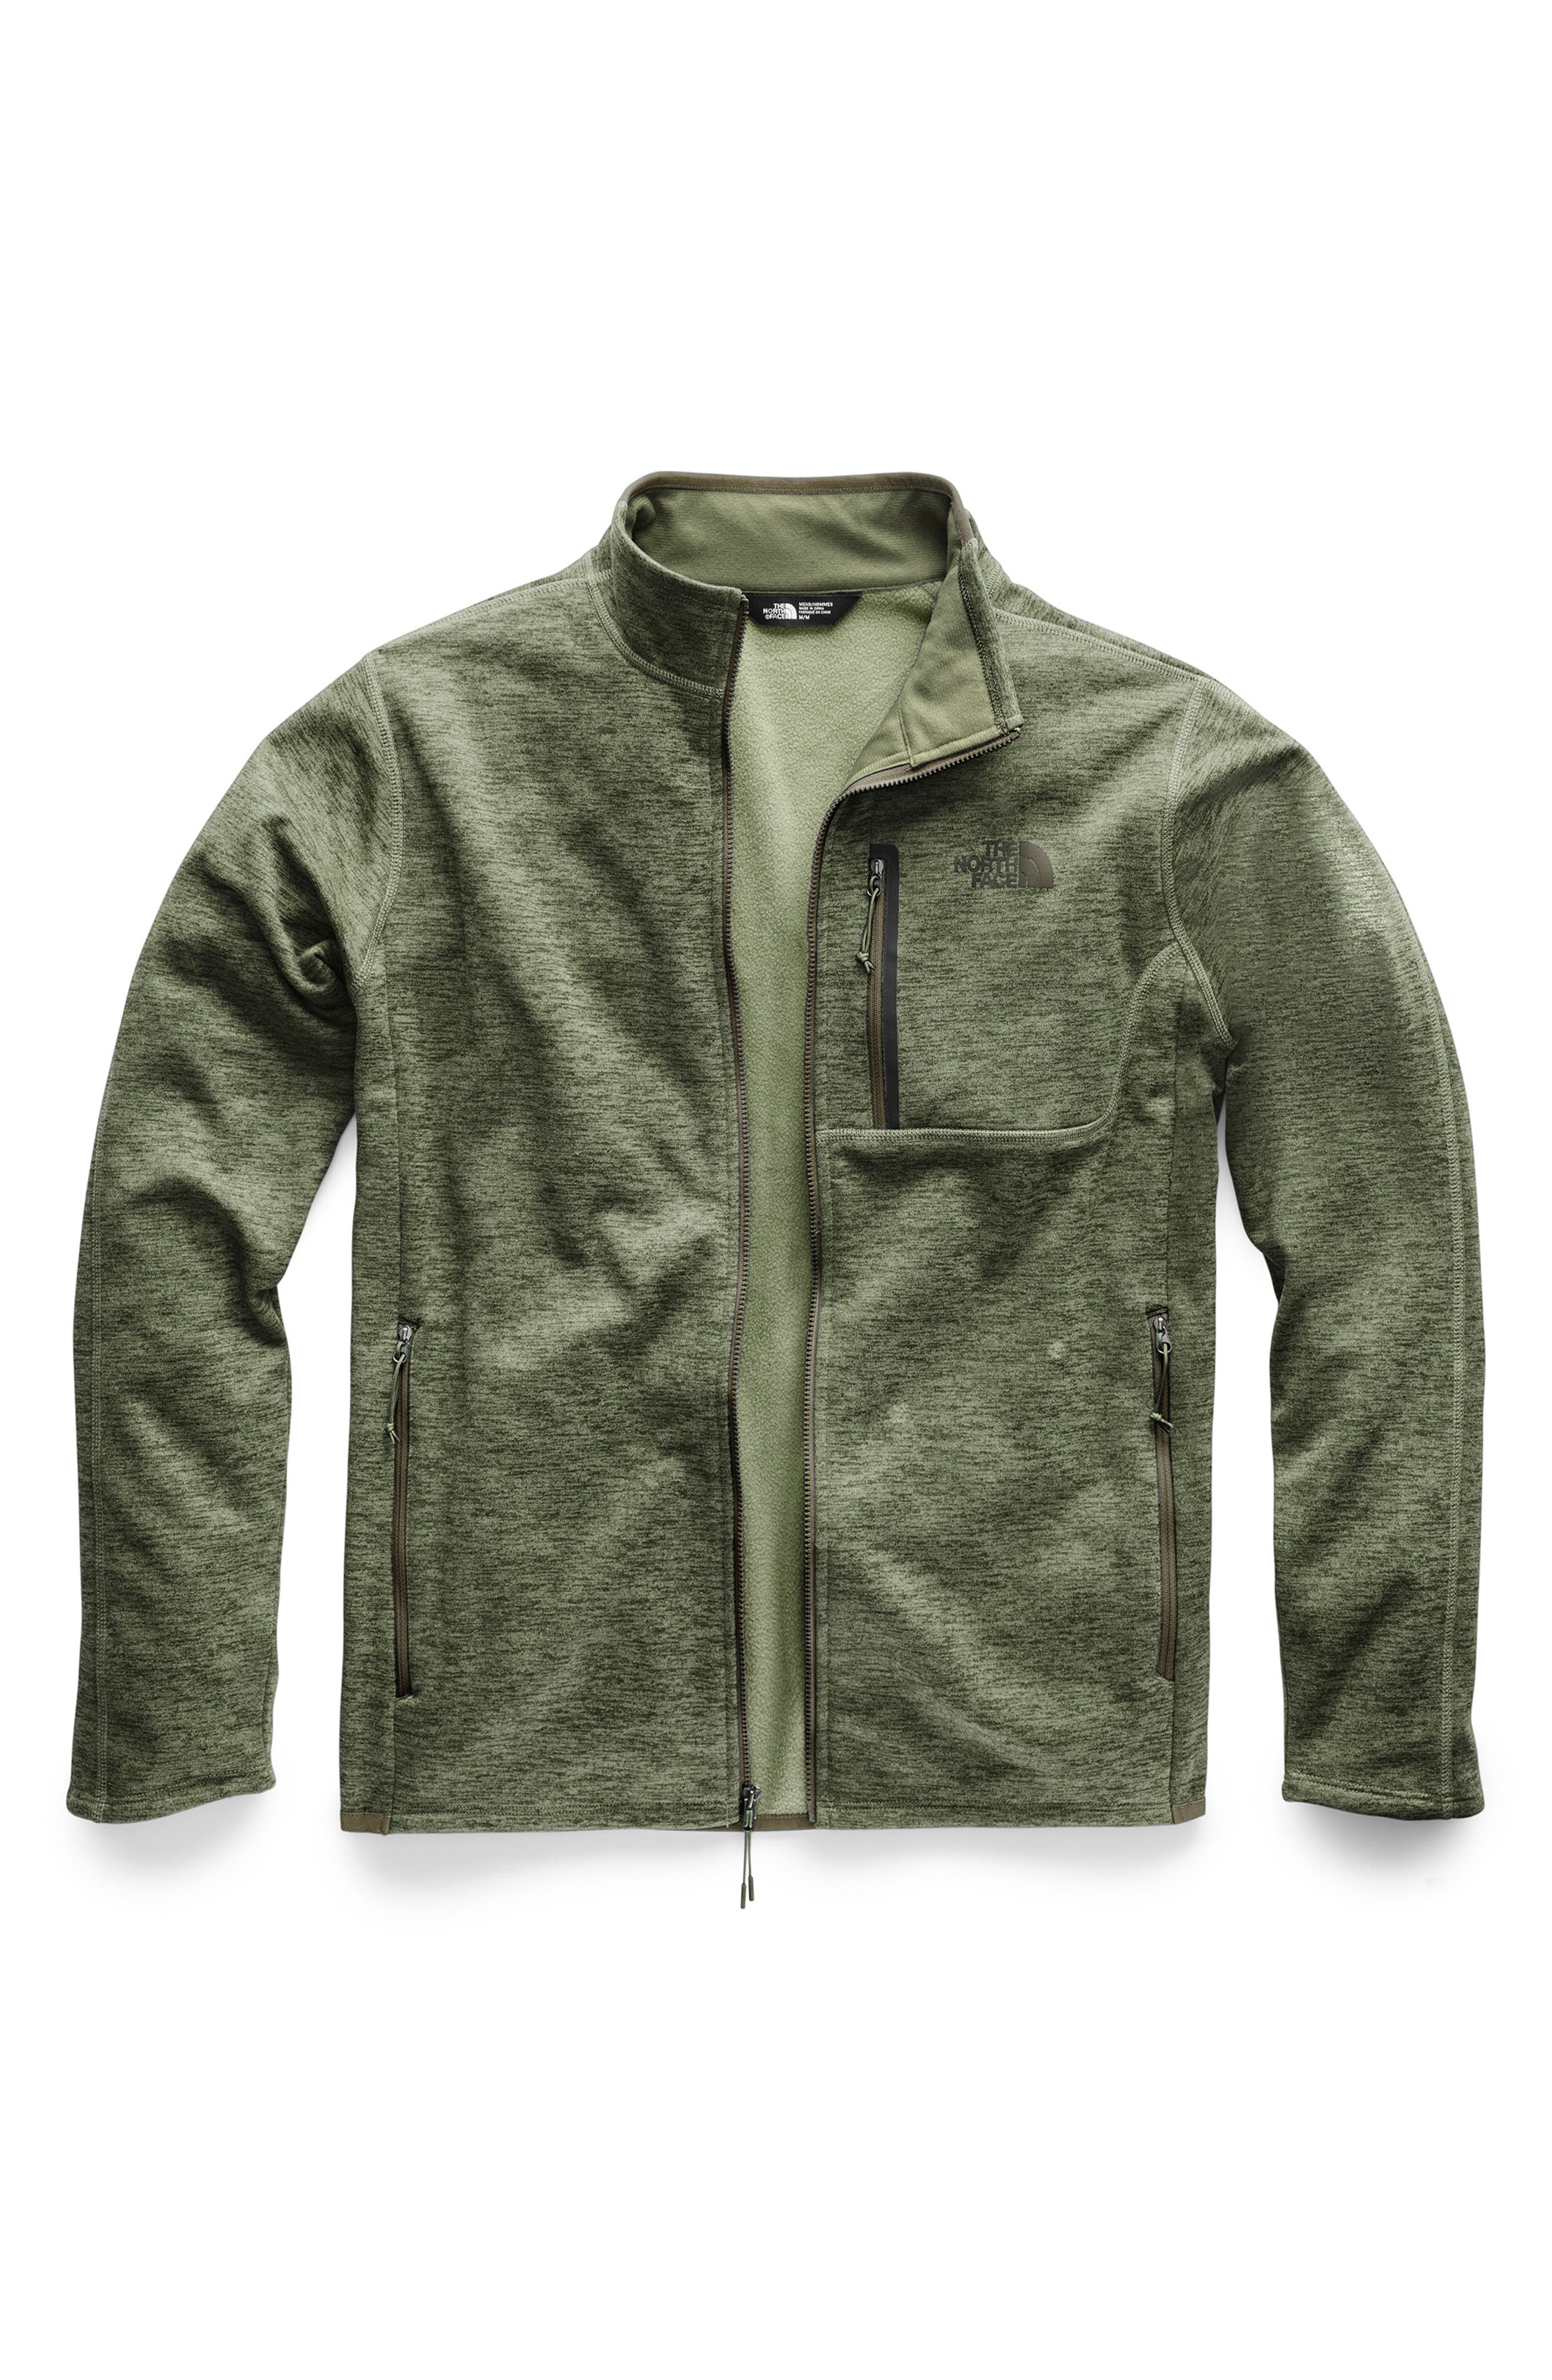 The North Face Canyonlands Zip Jacket, Green